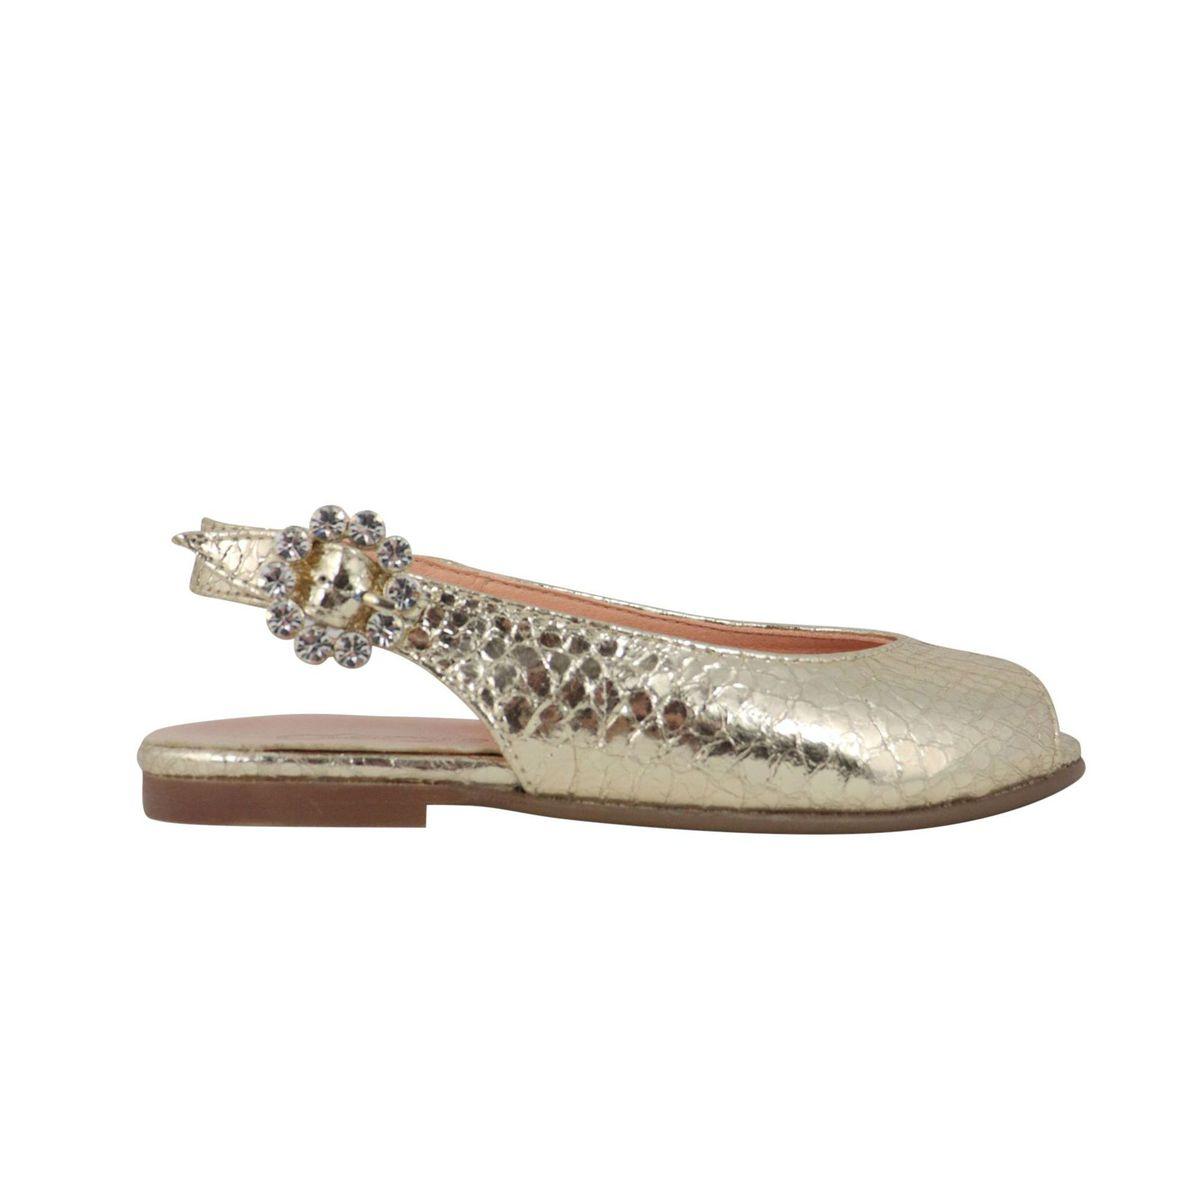 Peep-toe ballerina in leather with rhinestone buckle Platinum Clarys